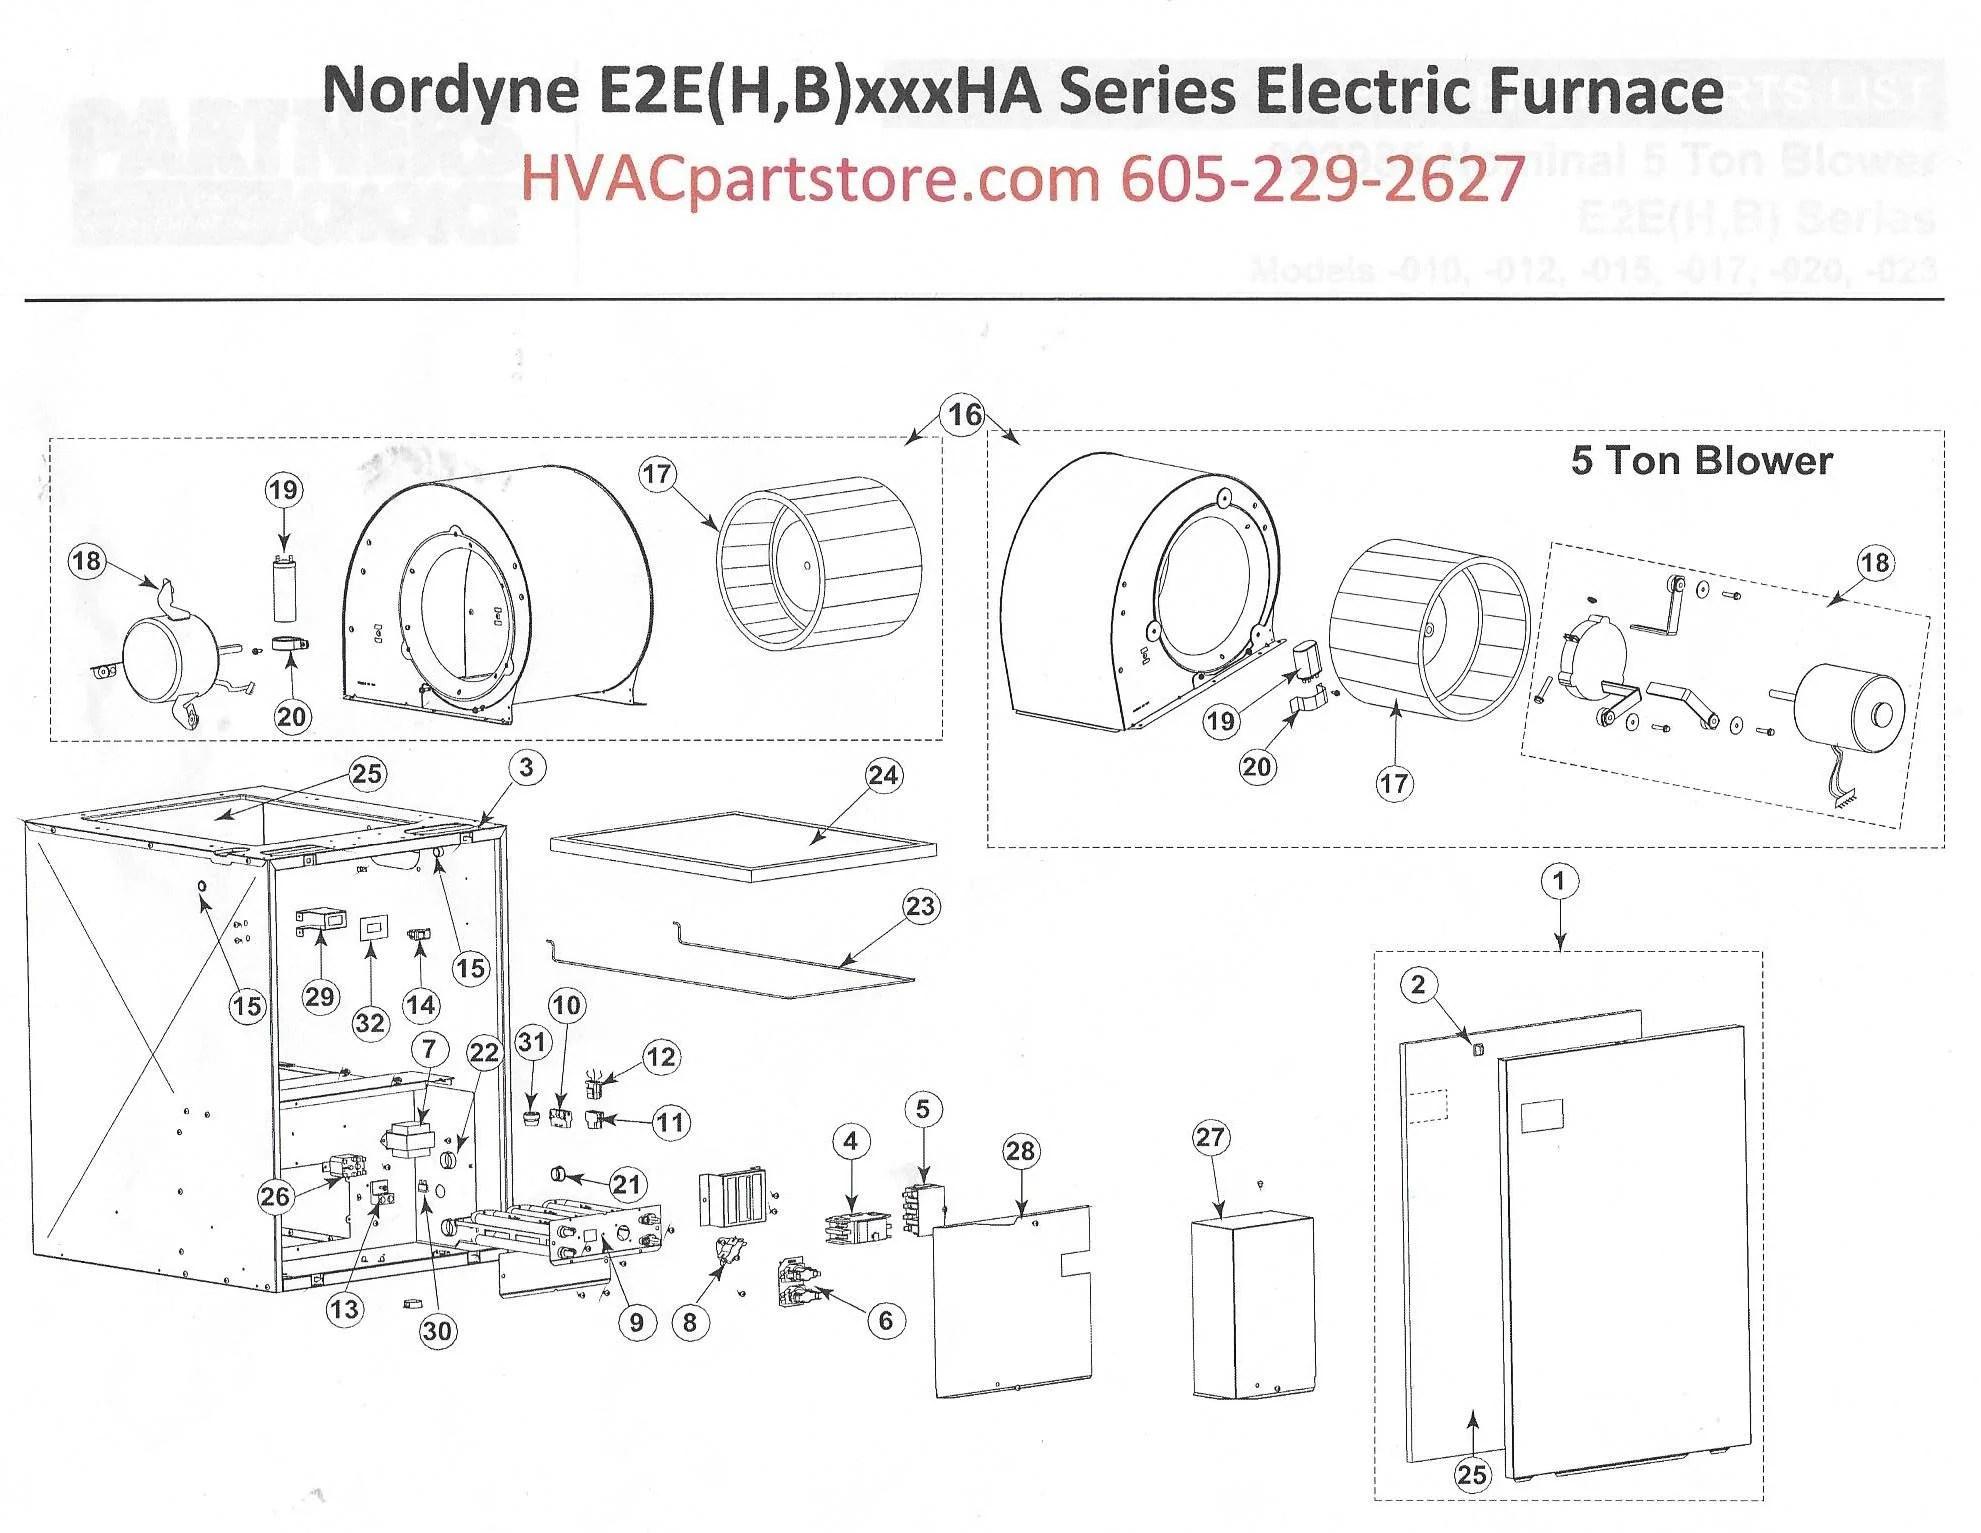 3f20 40b2 8e78 670eeb0ab556 9778179831979465996 eb23a furnace wiring diagram coleman gandul 45 77 79 nordyne furnace diagram nordyne ac units  [ 1981 x 1533 Pixel ]